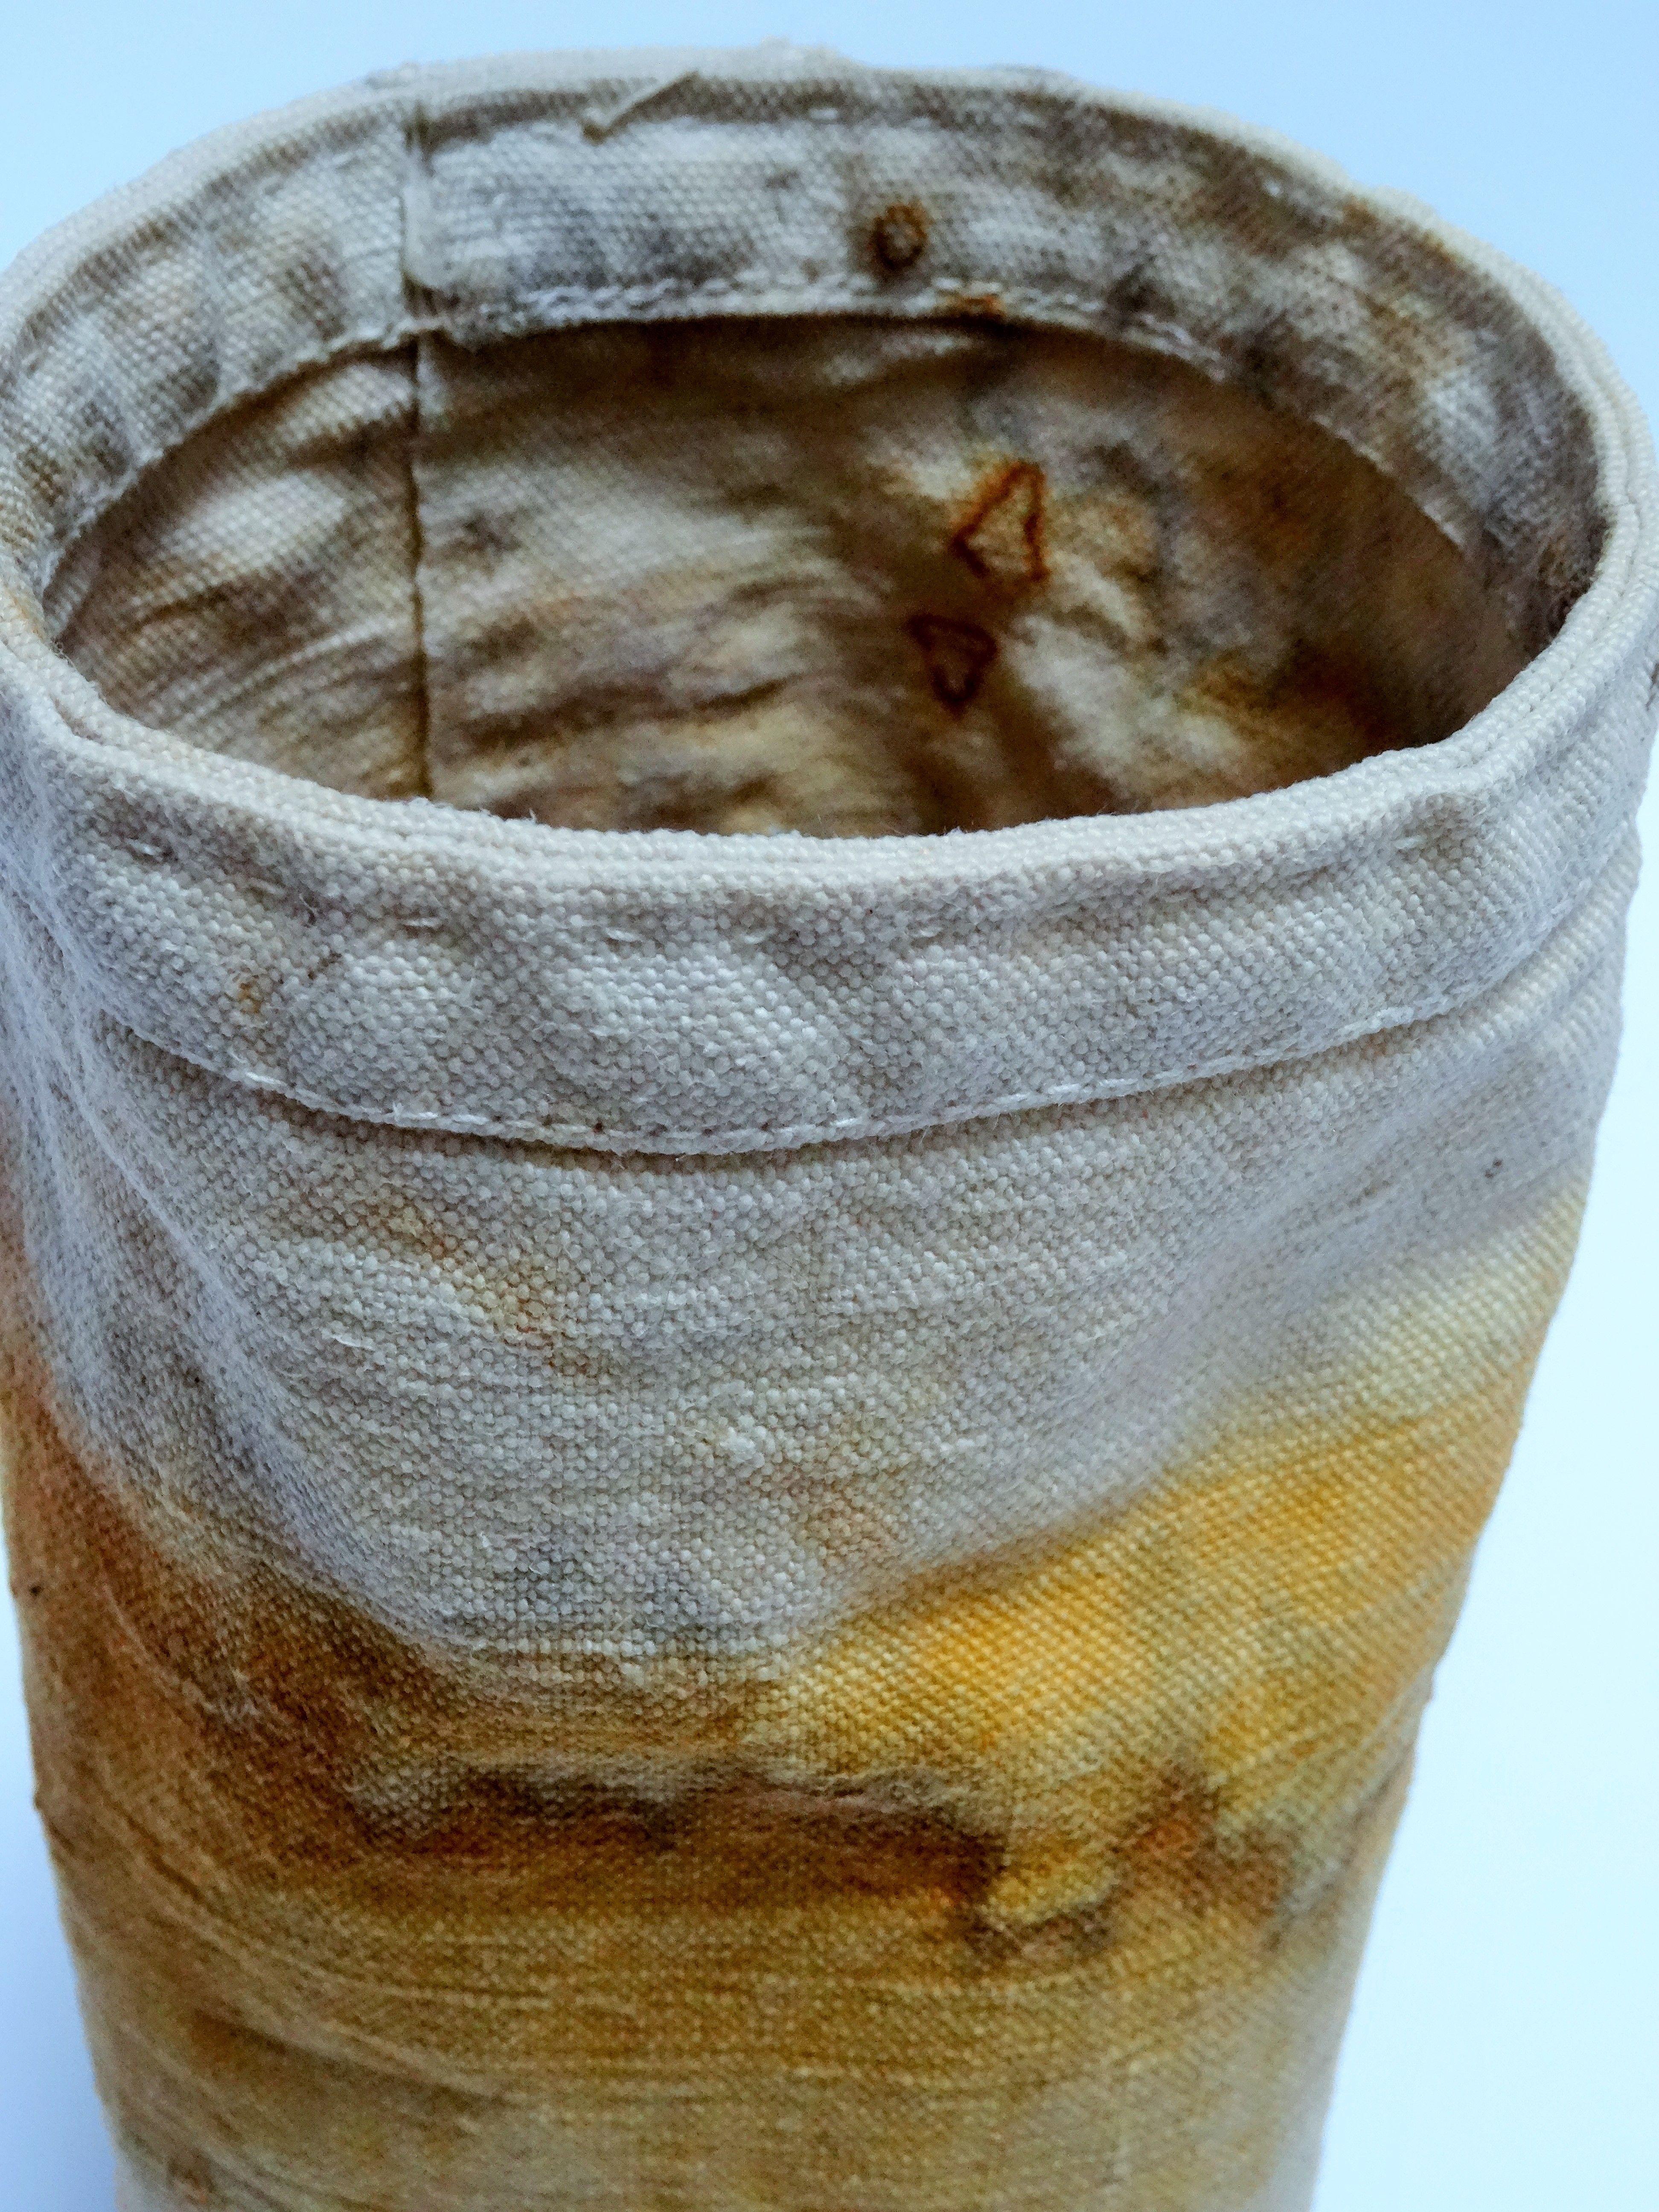 Jule Mallett - Rust dyed cloth vessel from vintage linen